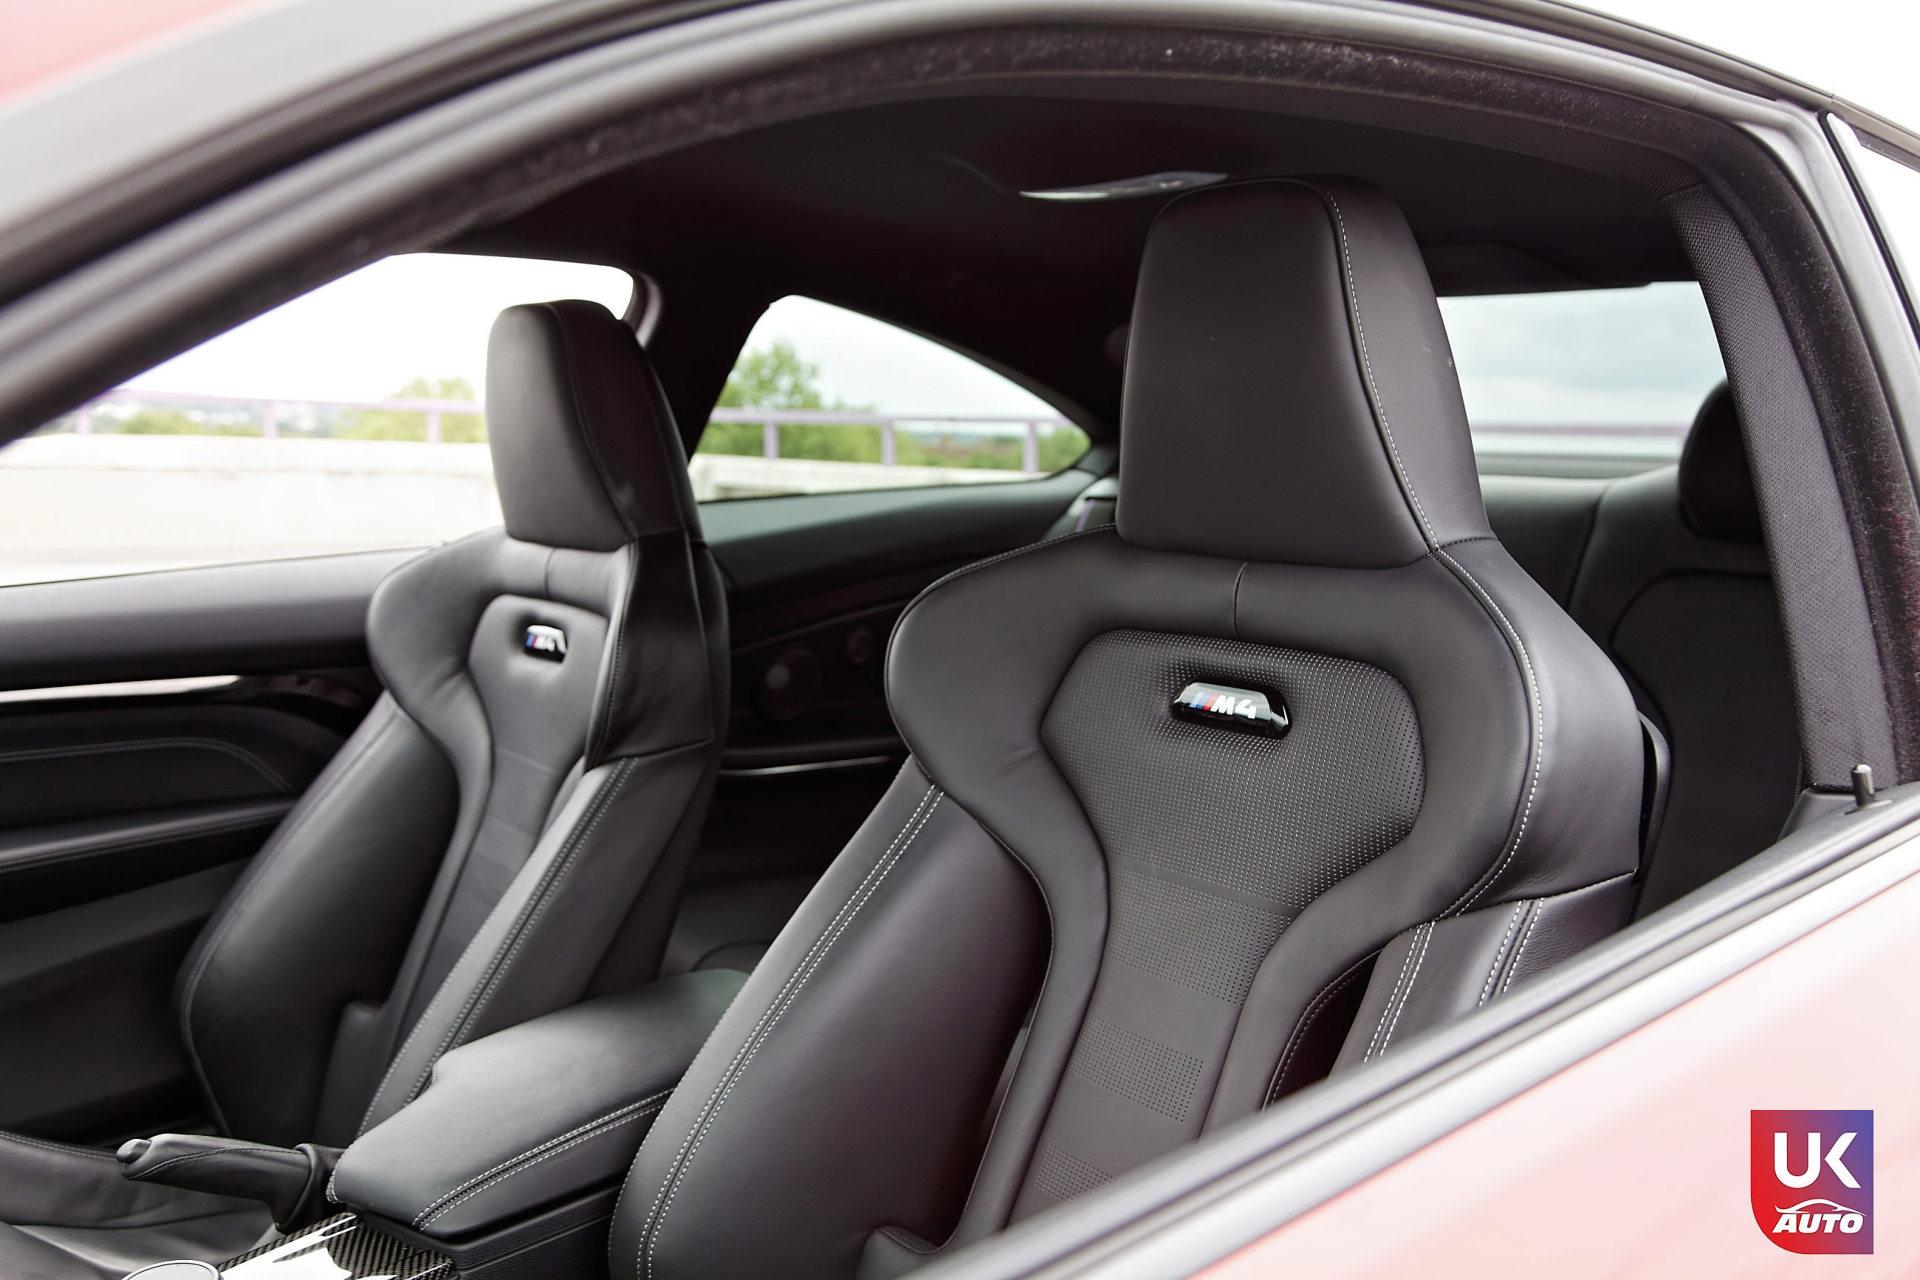 BMW M4 PACK COMPETITION BMW ANGLETERRE BMW IMPORT UK BMW MANDATAIRE AUTO13 DxO - IMPORTATION BMW M4 BMW IMPORT ROYAUME UNI BMW M4 COMPETITION RHD CLIENT UKAUTO